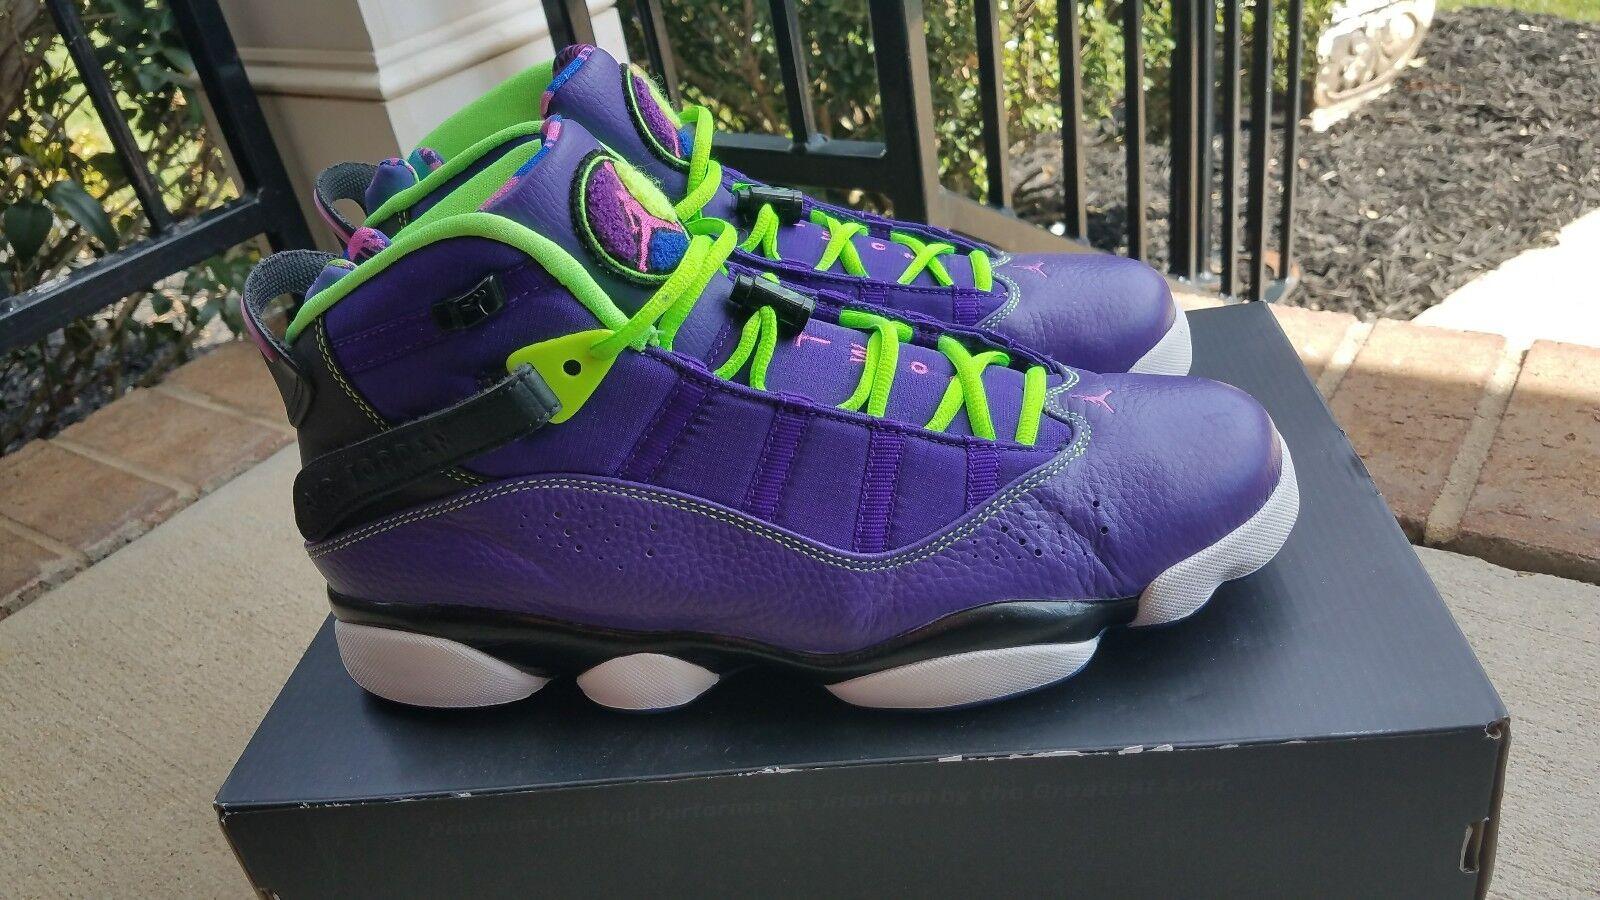 Nike Air Jordan 6 Rings Bel Air Court Purple Shoes SIZE 11 Seasonal clearance sale